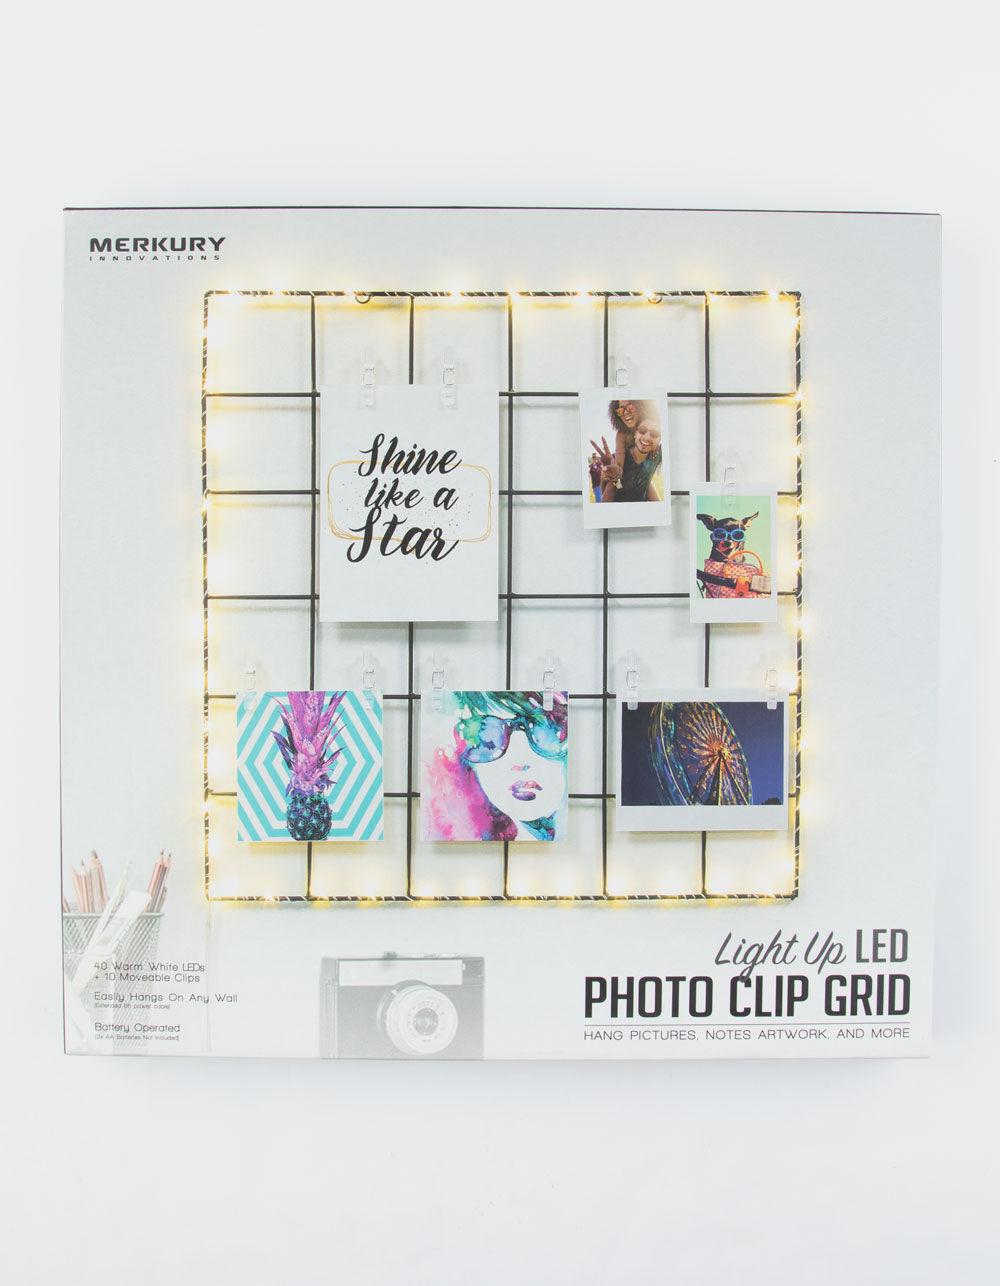 Merkury Innovations Light Up Led Photo Clip Grid Black Milgc01101 In 2020 Photo Clips Light Up Innovations Lighting